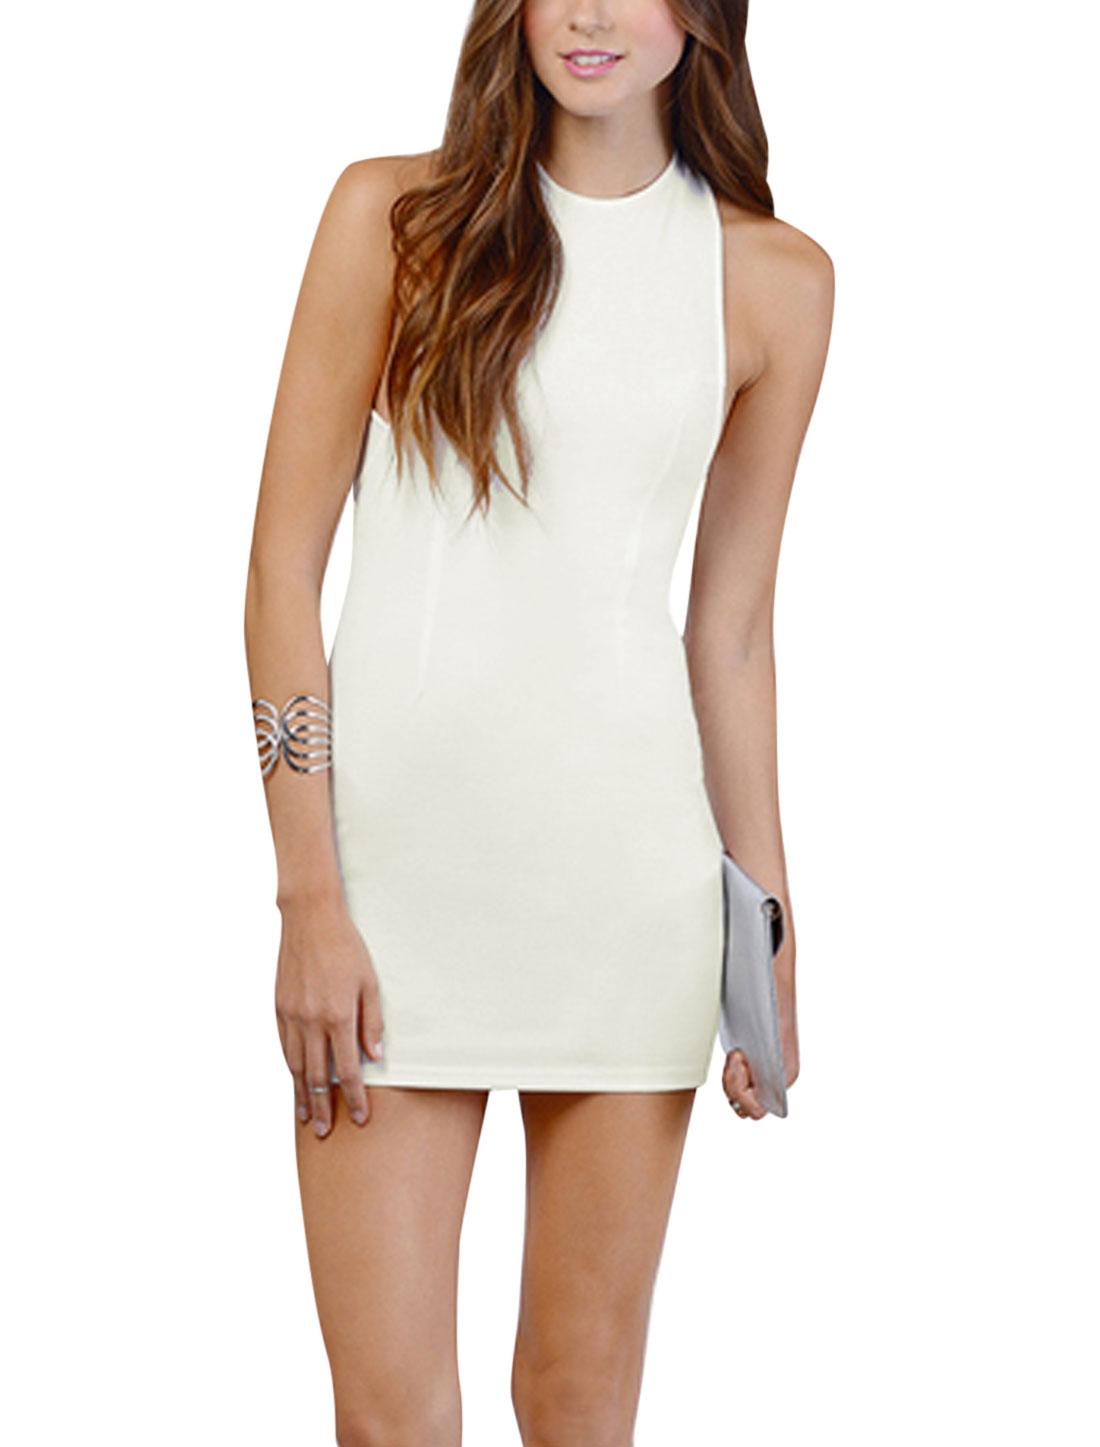 Women Halter Neck Sleeveless Unlined Bandage Dress White XS